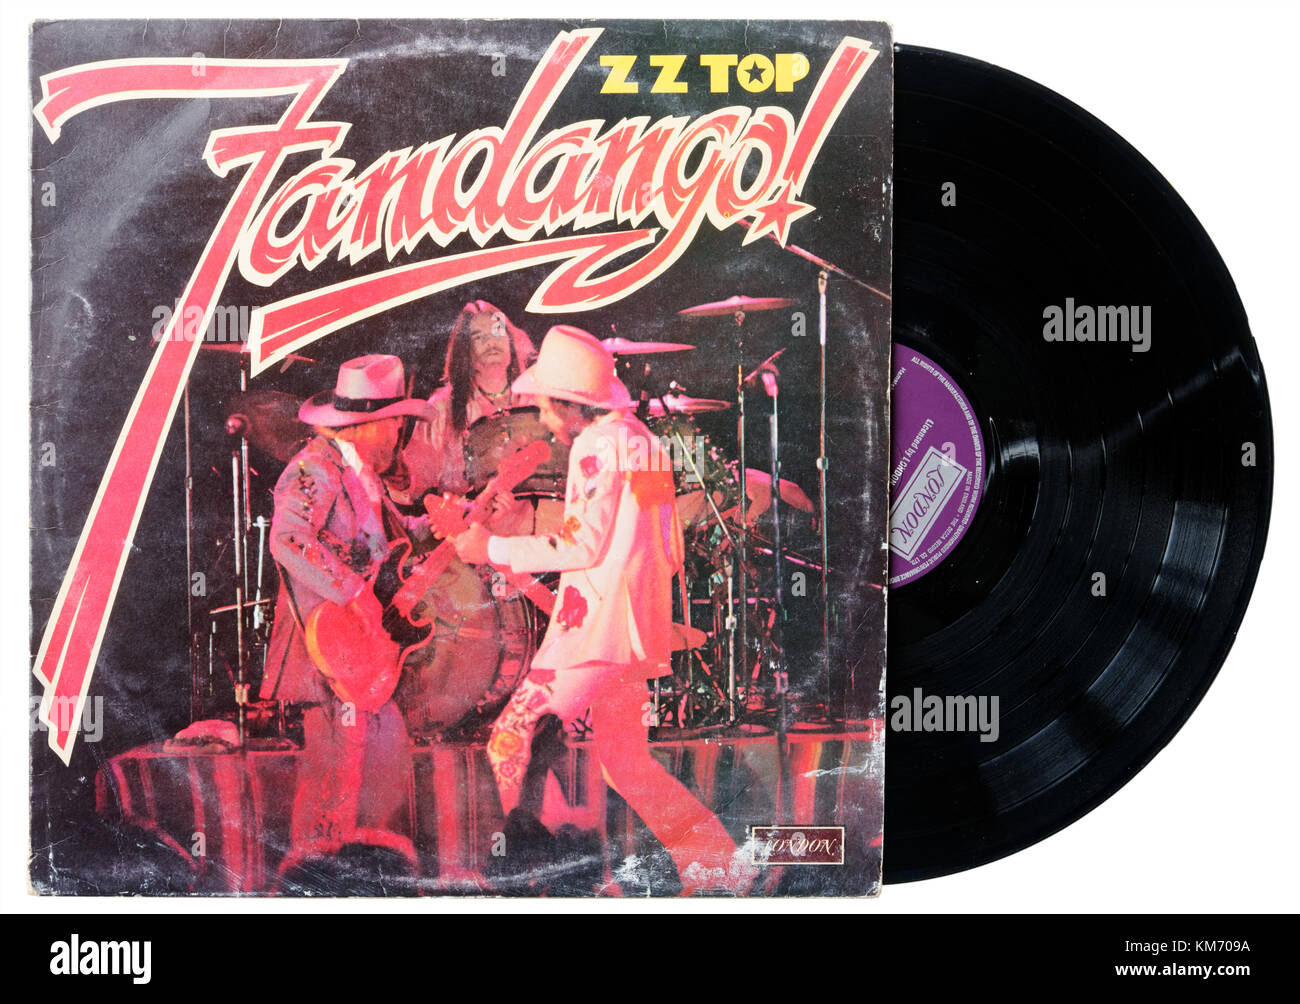 ZZ Top Fandango album - Stock Image